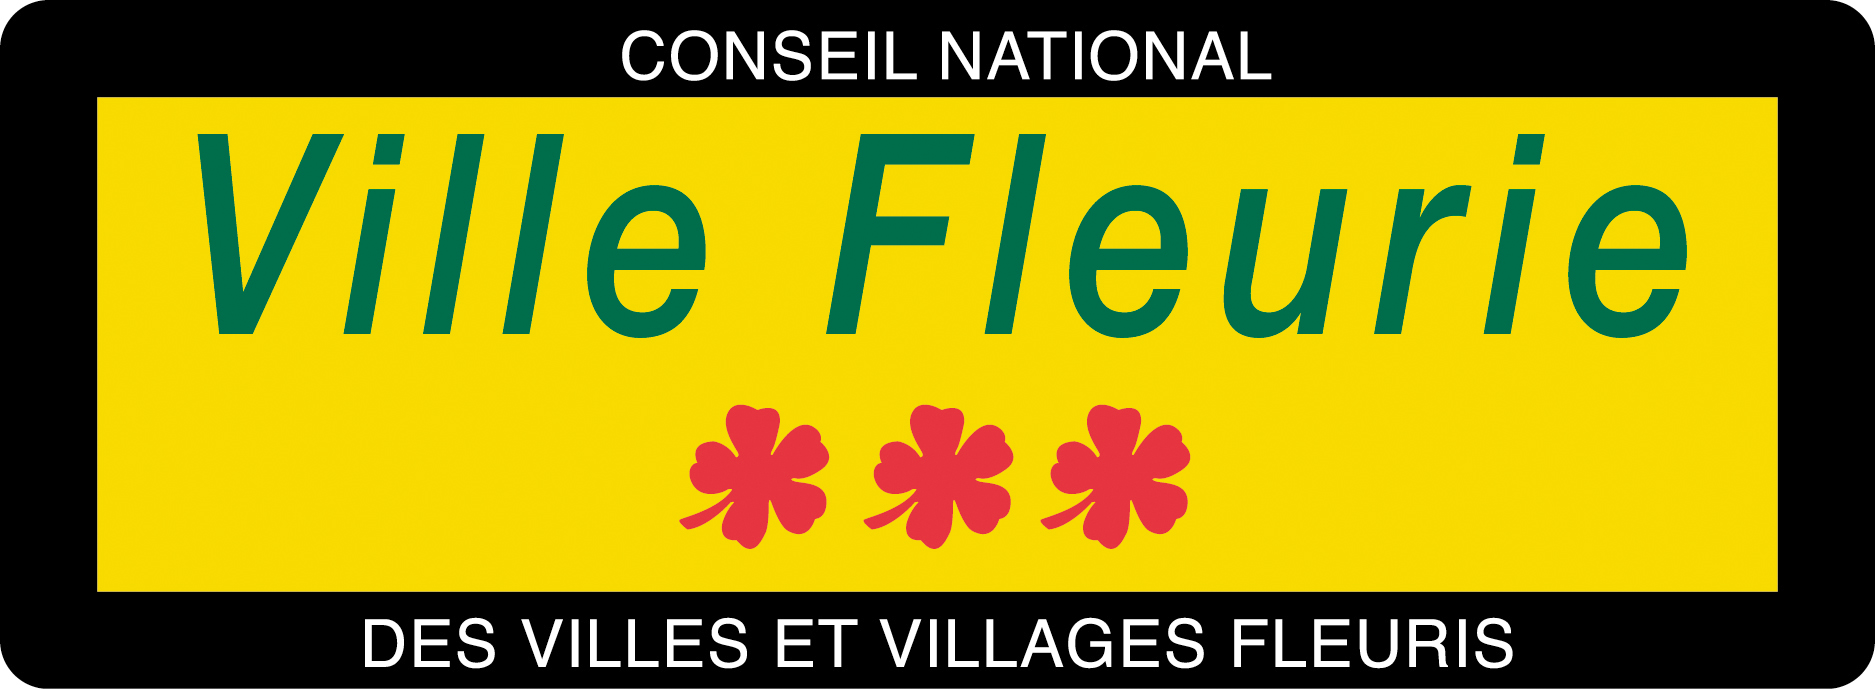 Panneau Ville Fleurie